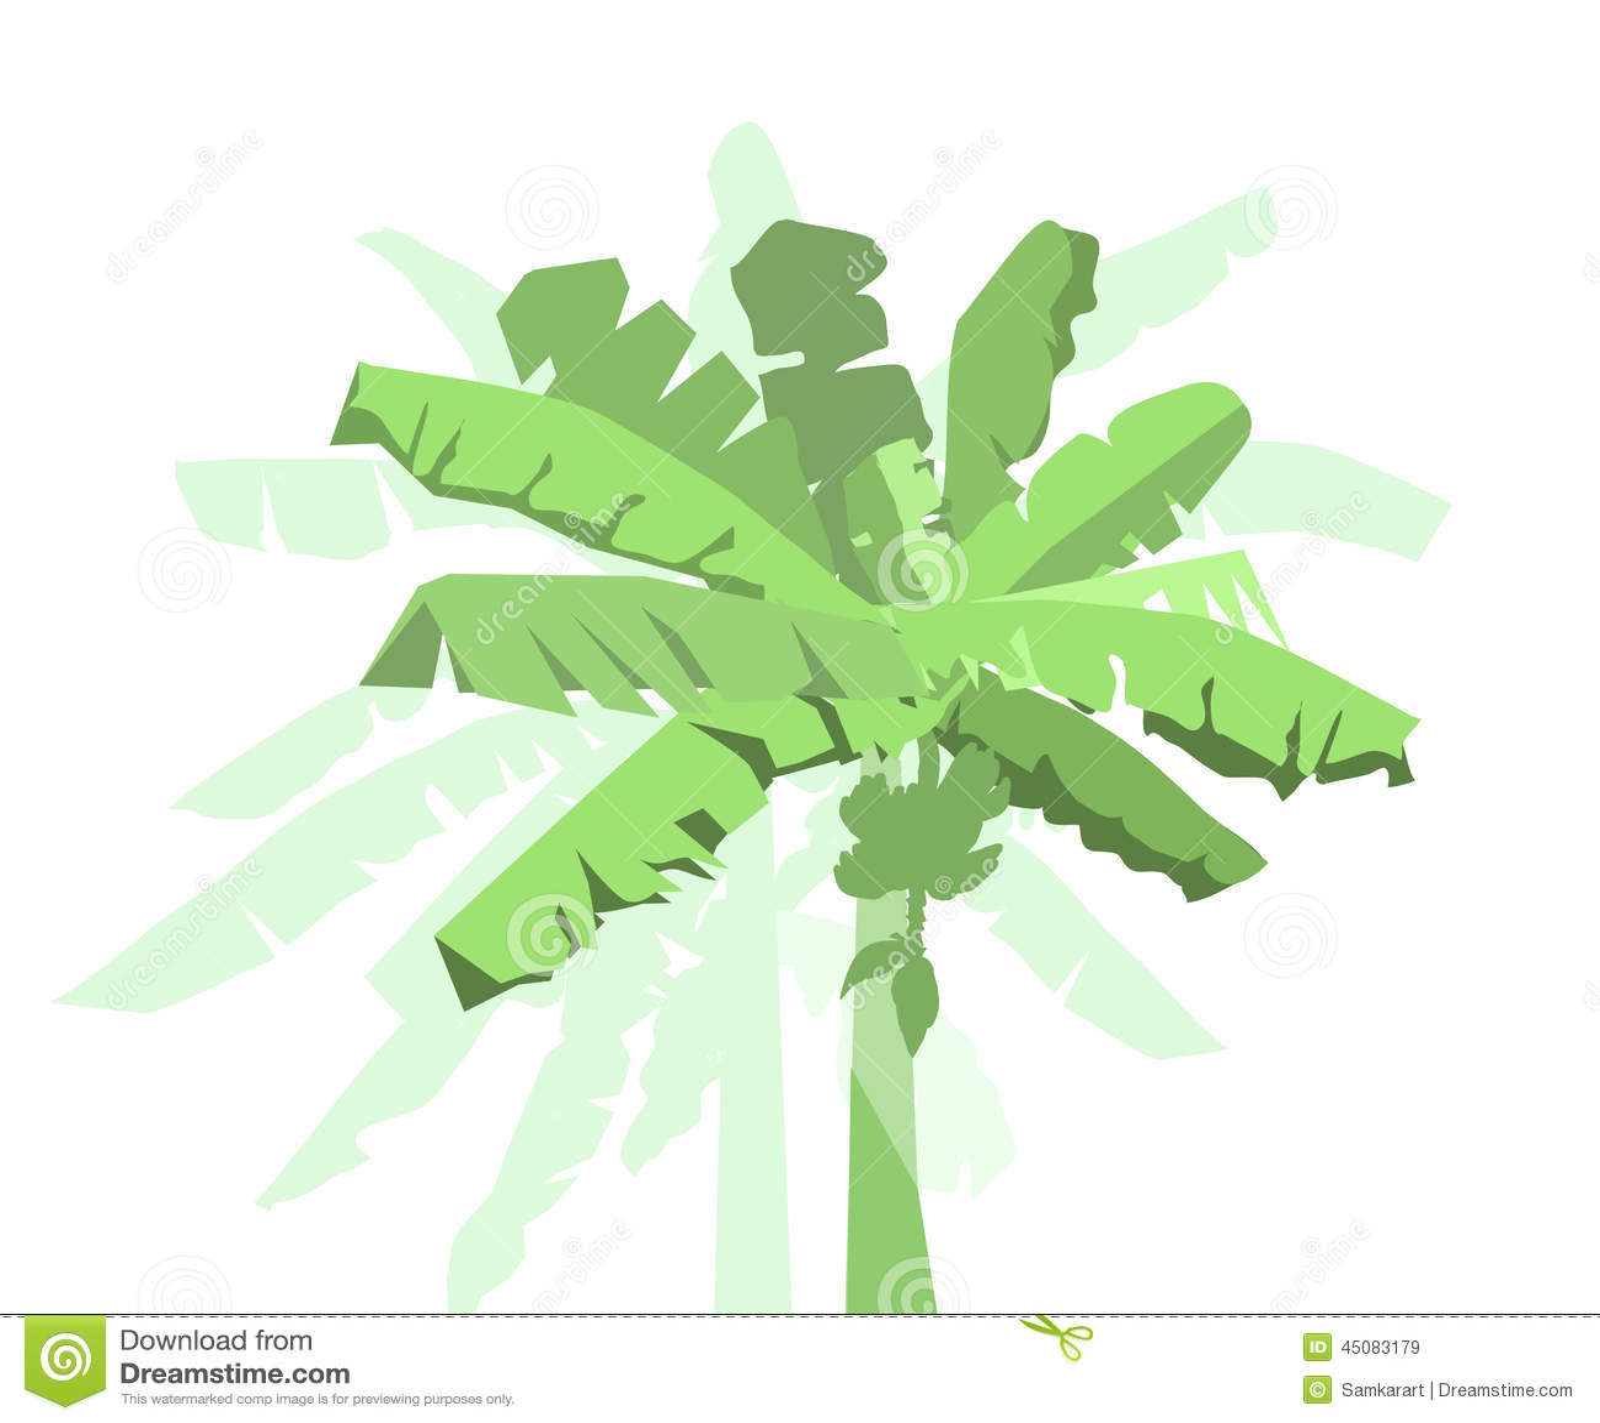 banana tree leaves vector - photo #22